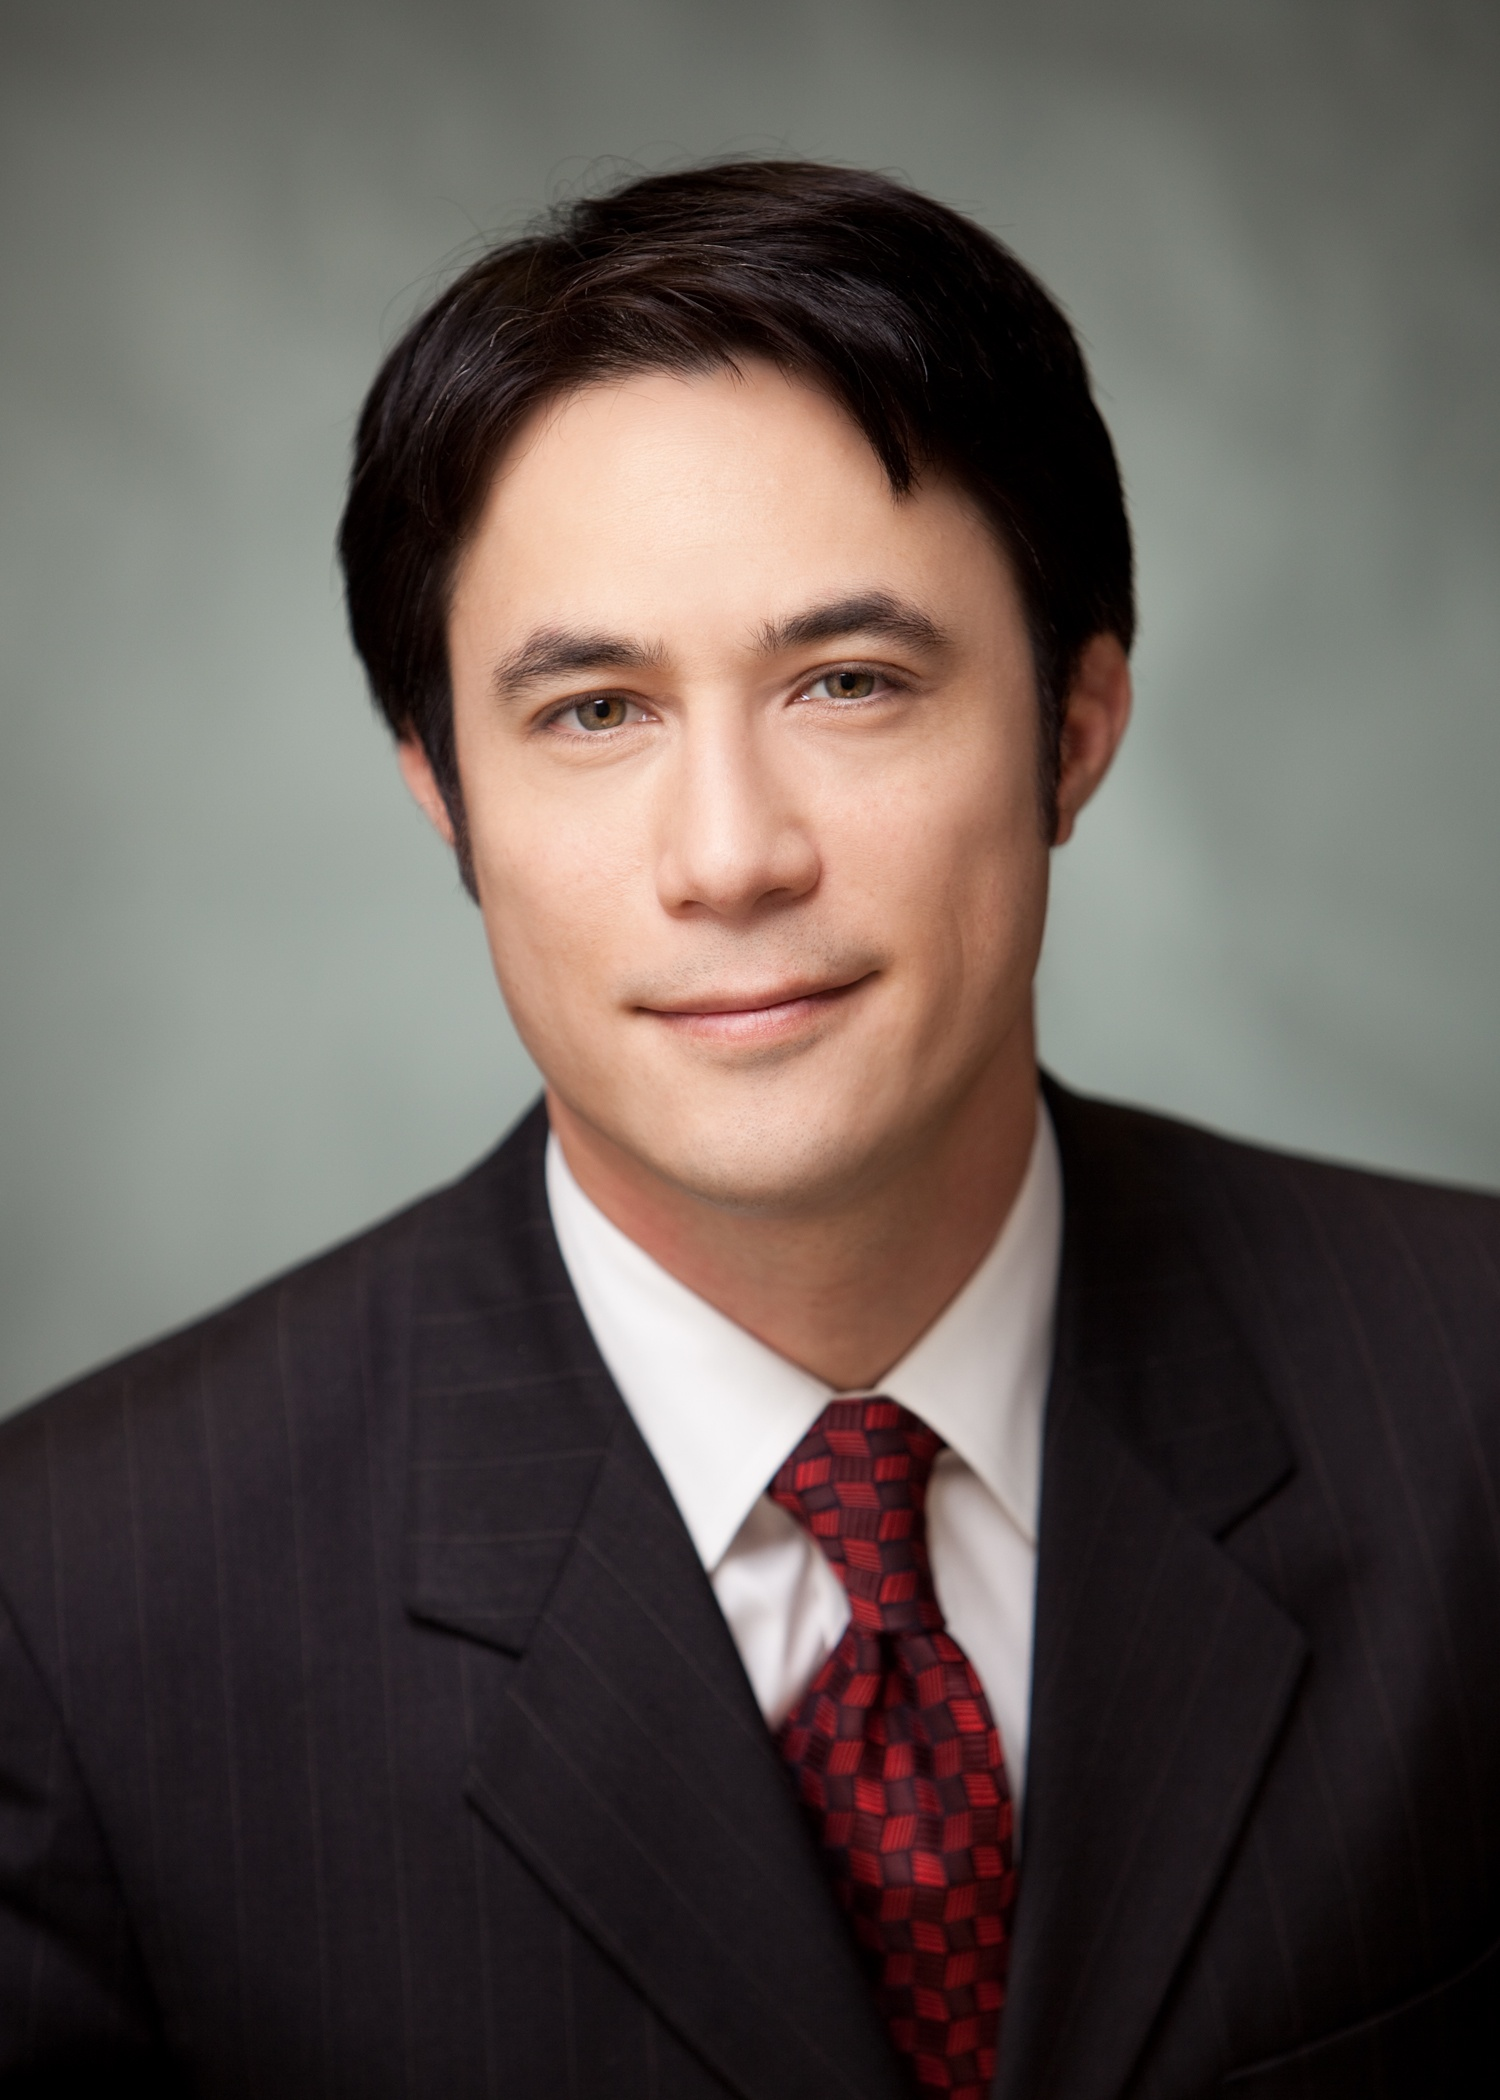 David W Kohl (International Trade Liaison) Color Headshot